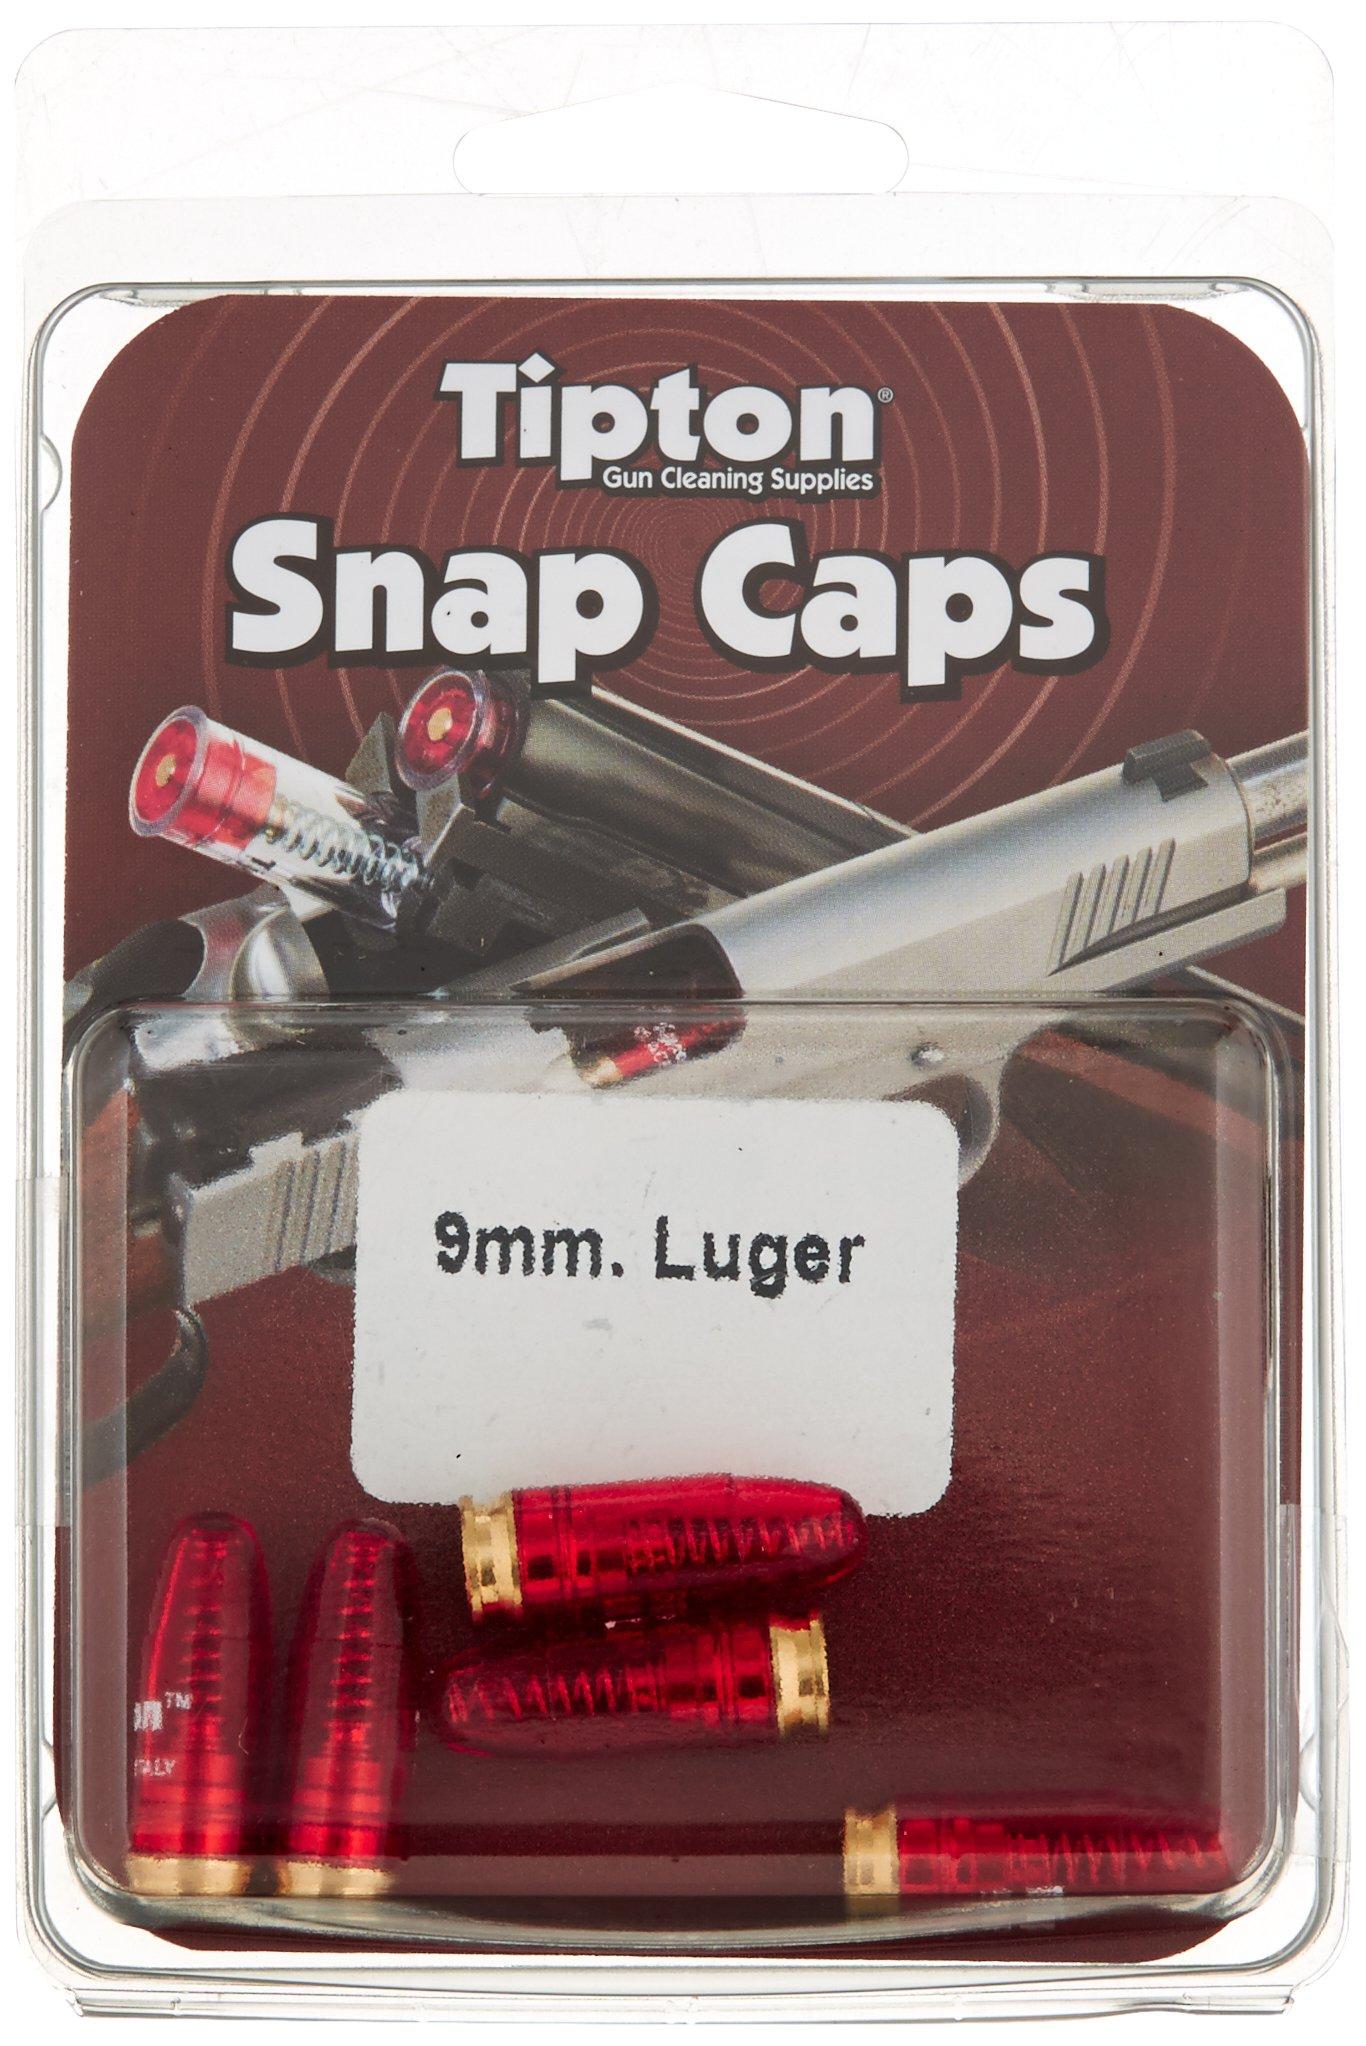 Tipton Snap Cap Pistol 9mm Luger 5 Pack